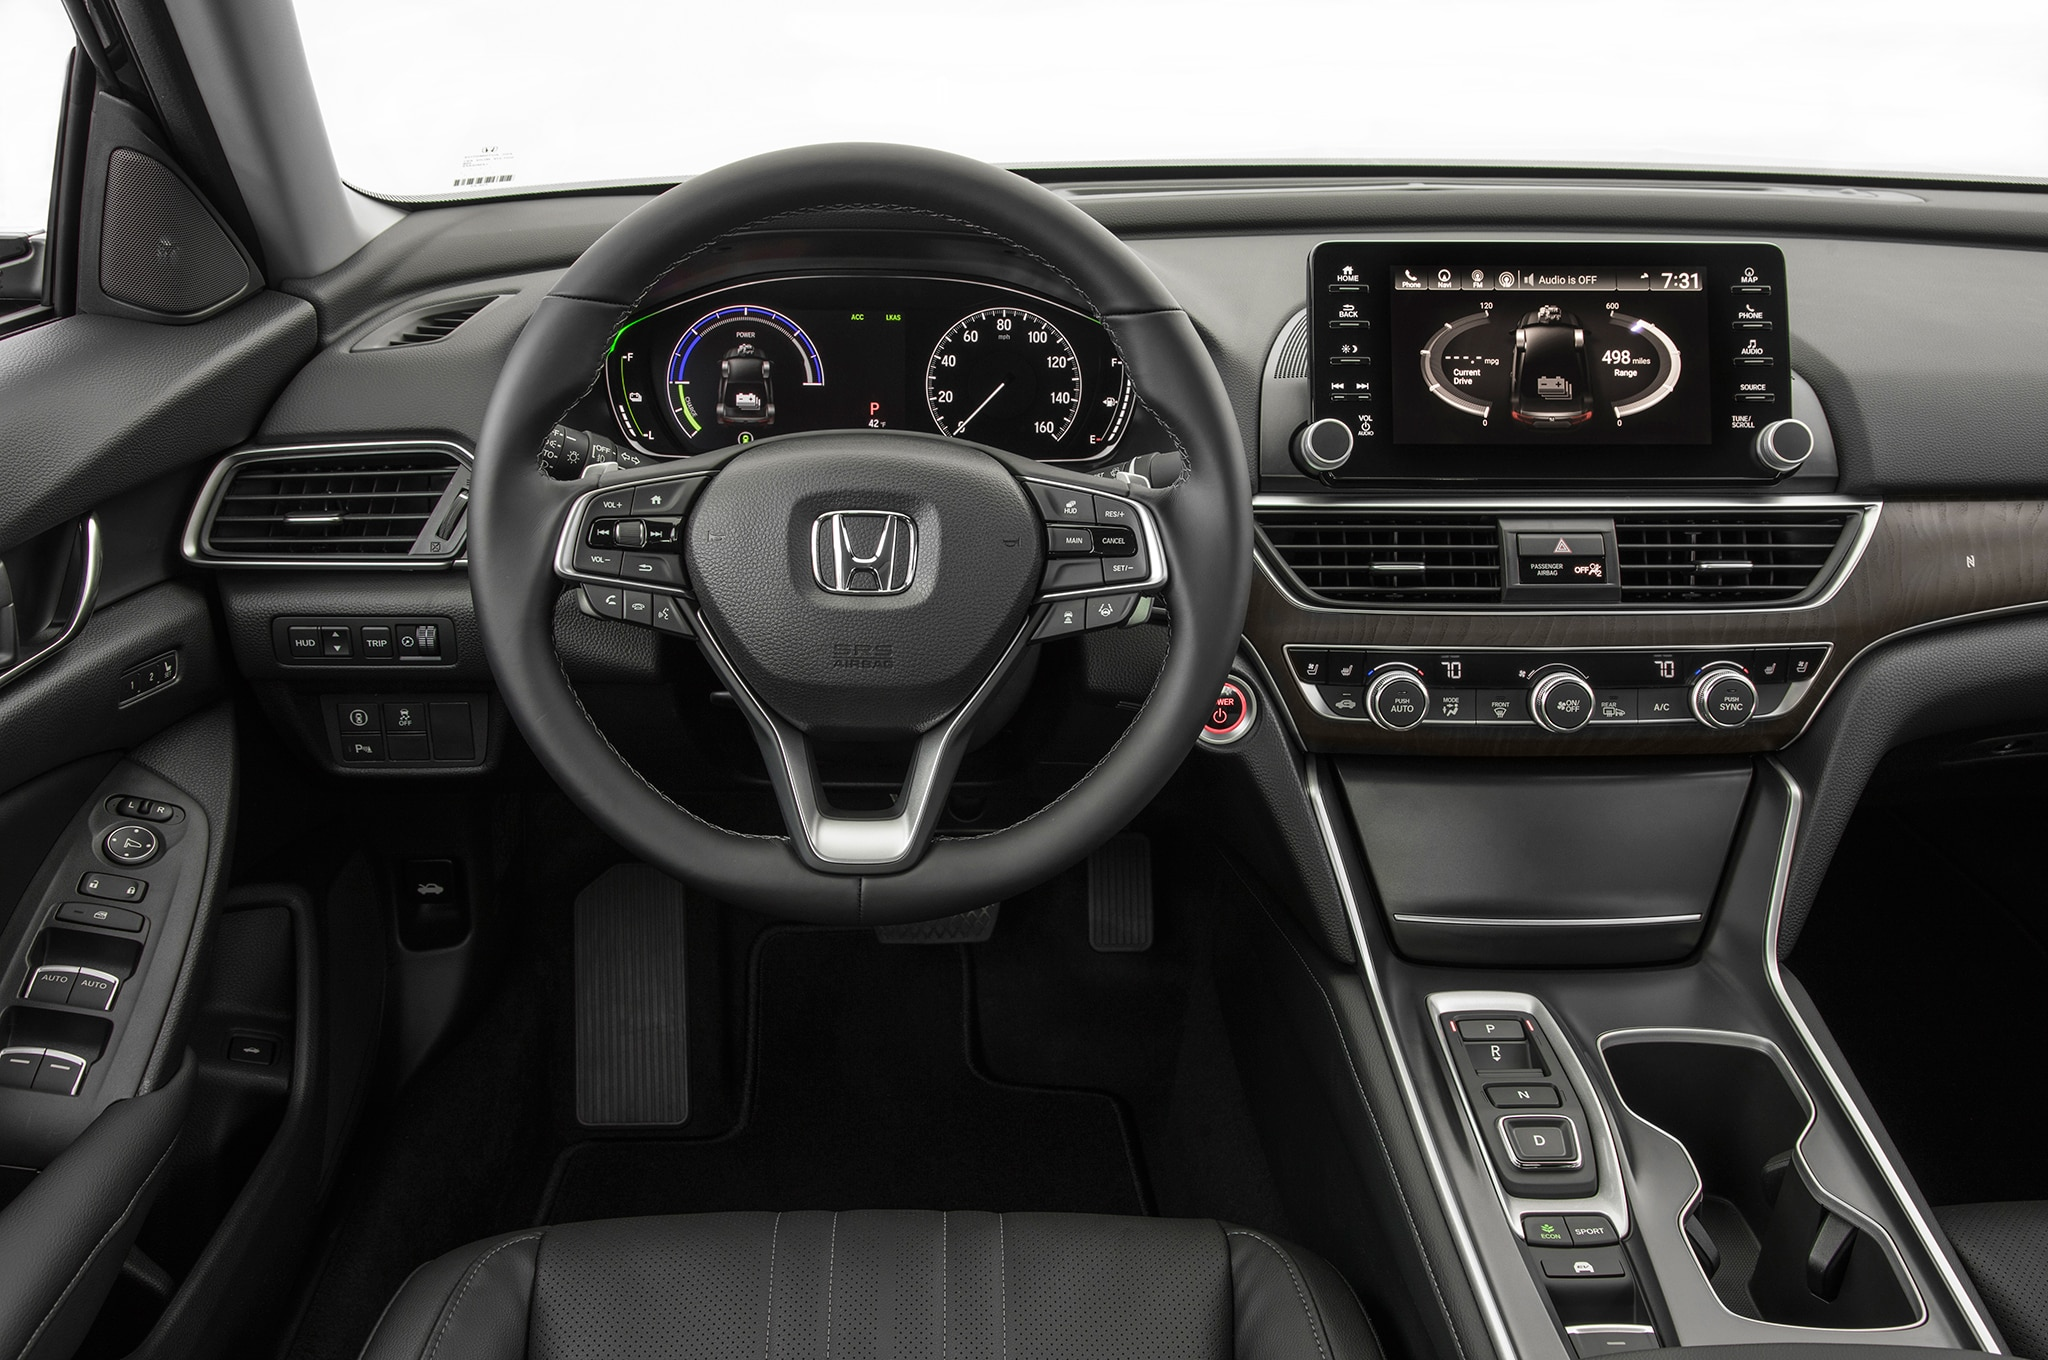 Honda Civic Hybrid Bateria >> Honda Accord 2018: Primera Prueba - Motor Trend en Español